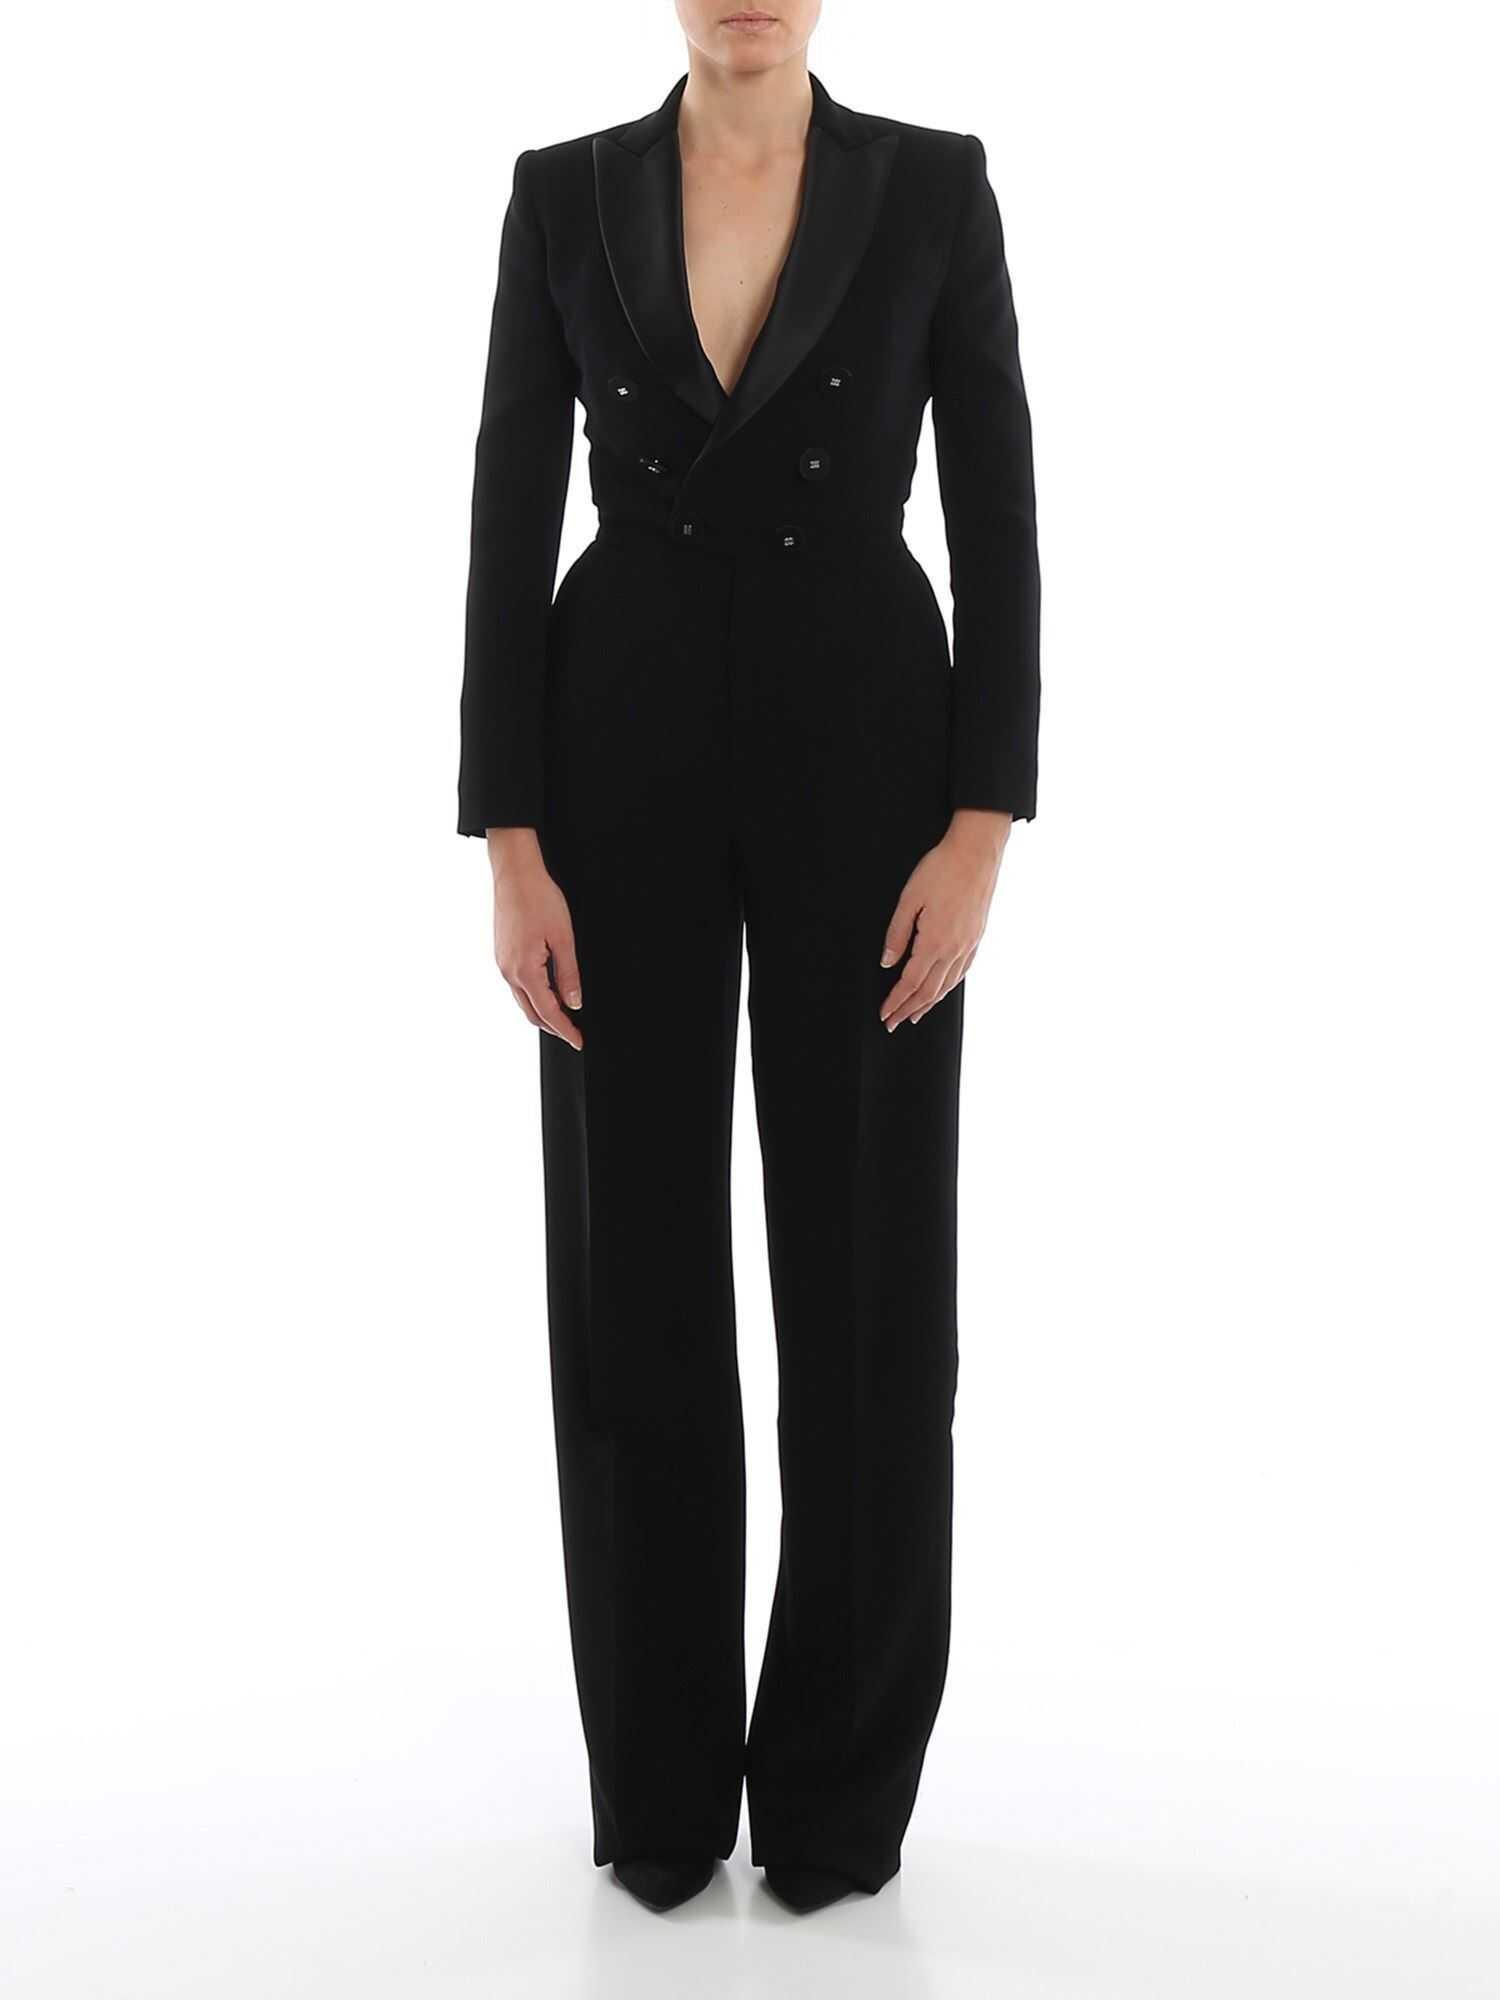 DSQUARED2 Oscar Black Viscose Crepe Jumpsuit Black